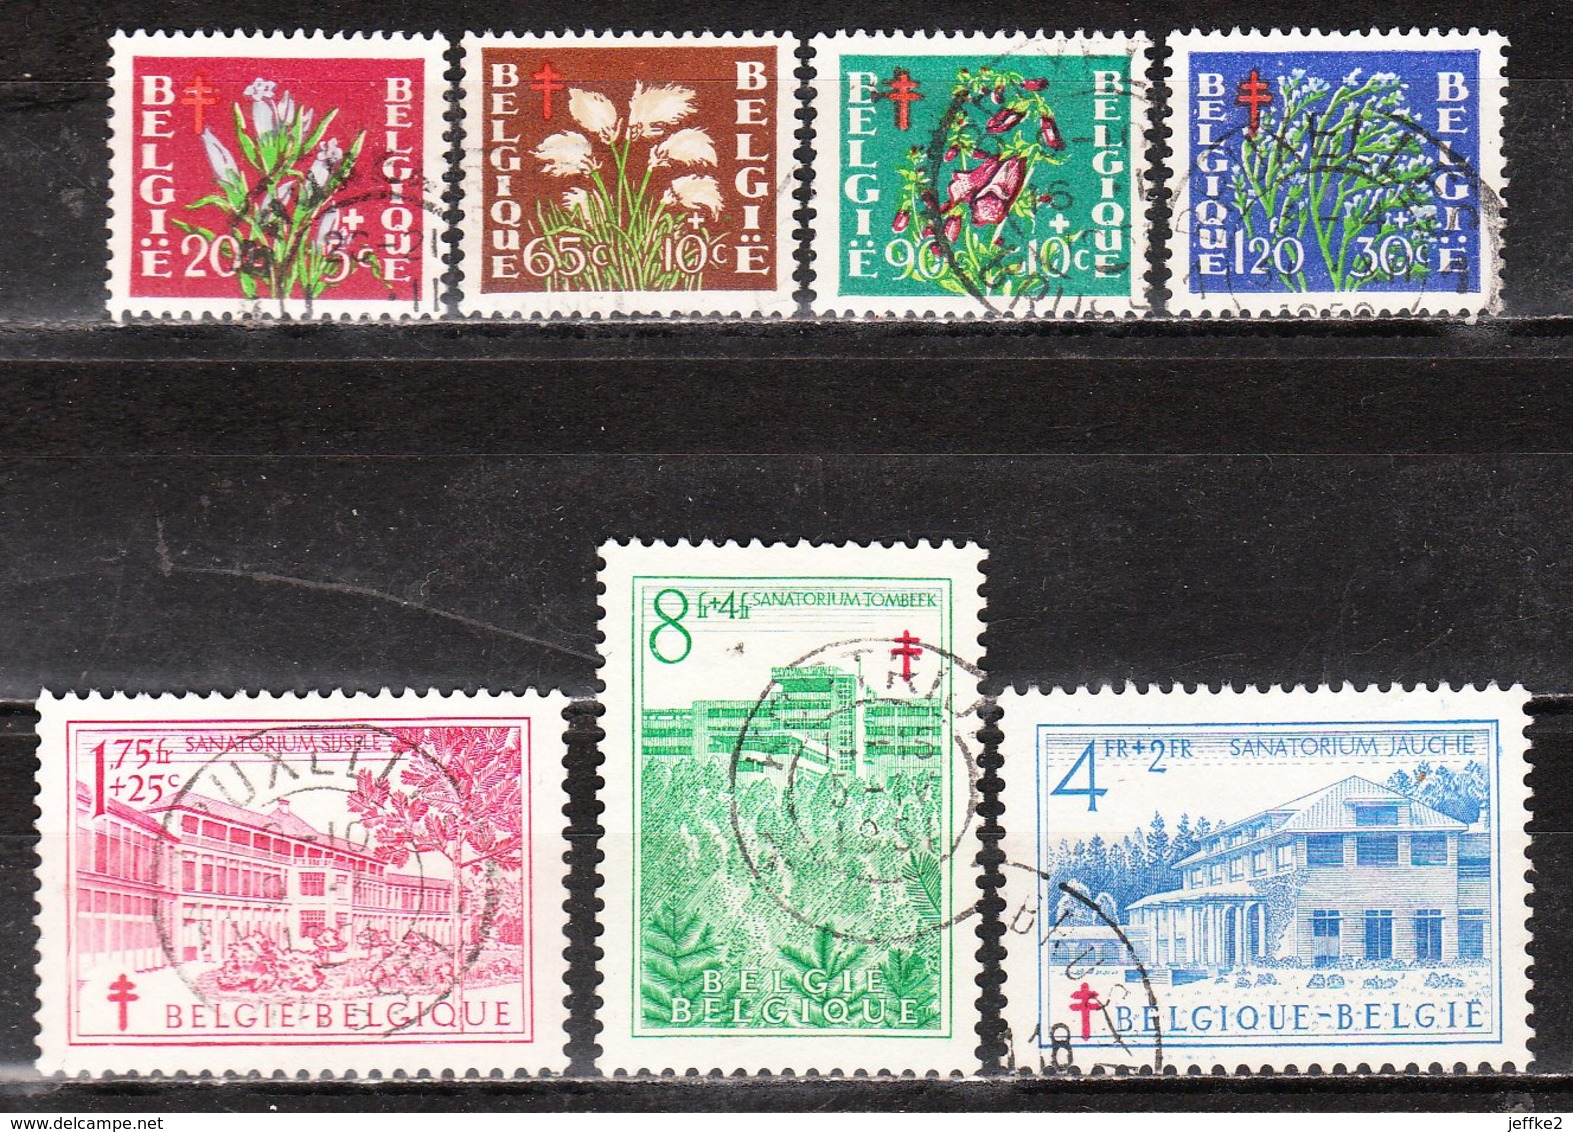 834/40  Antituberculeux - Série Complète - Oblit. - LOOK!!!! - Used Stamps